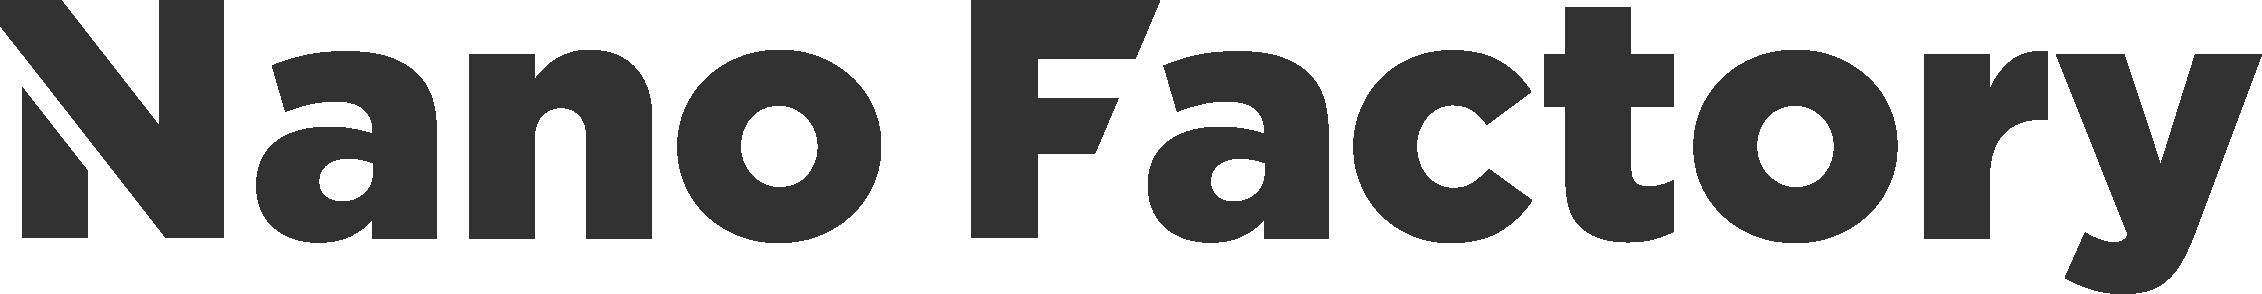 NanoFactory-logo-black